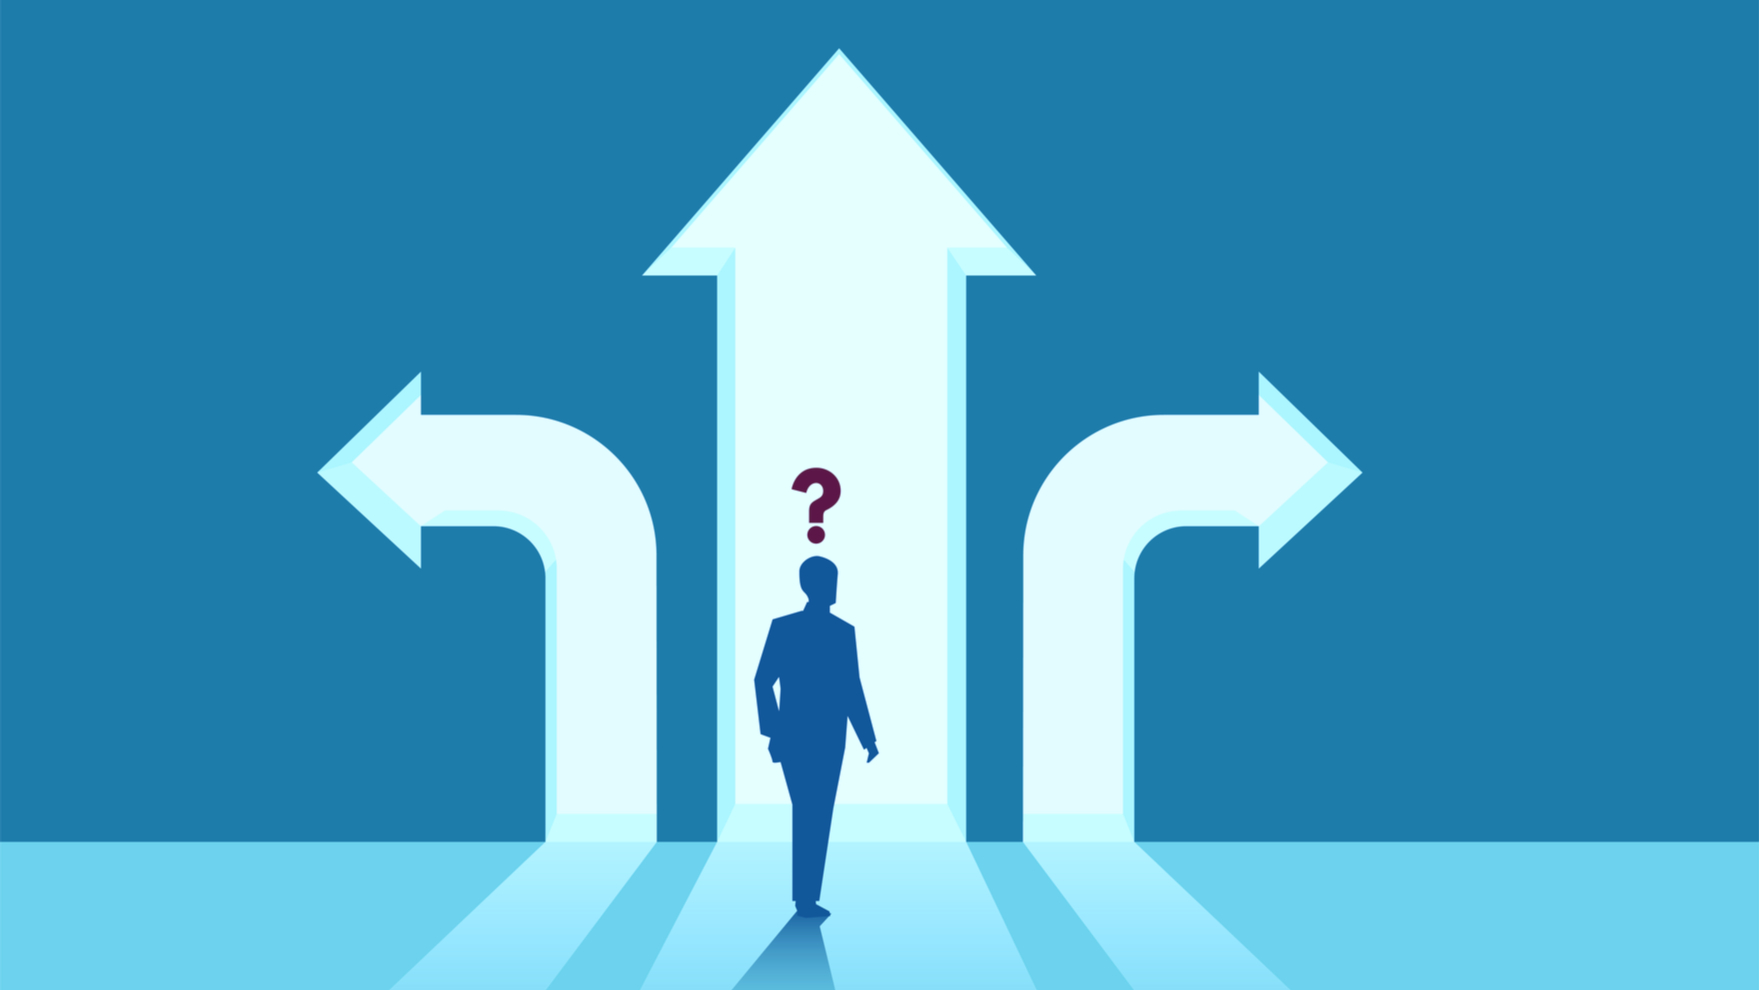 Can Cognitive Automation Help You Make Better Procurement Decisions?